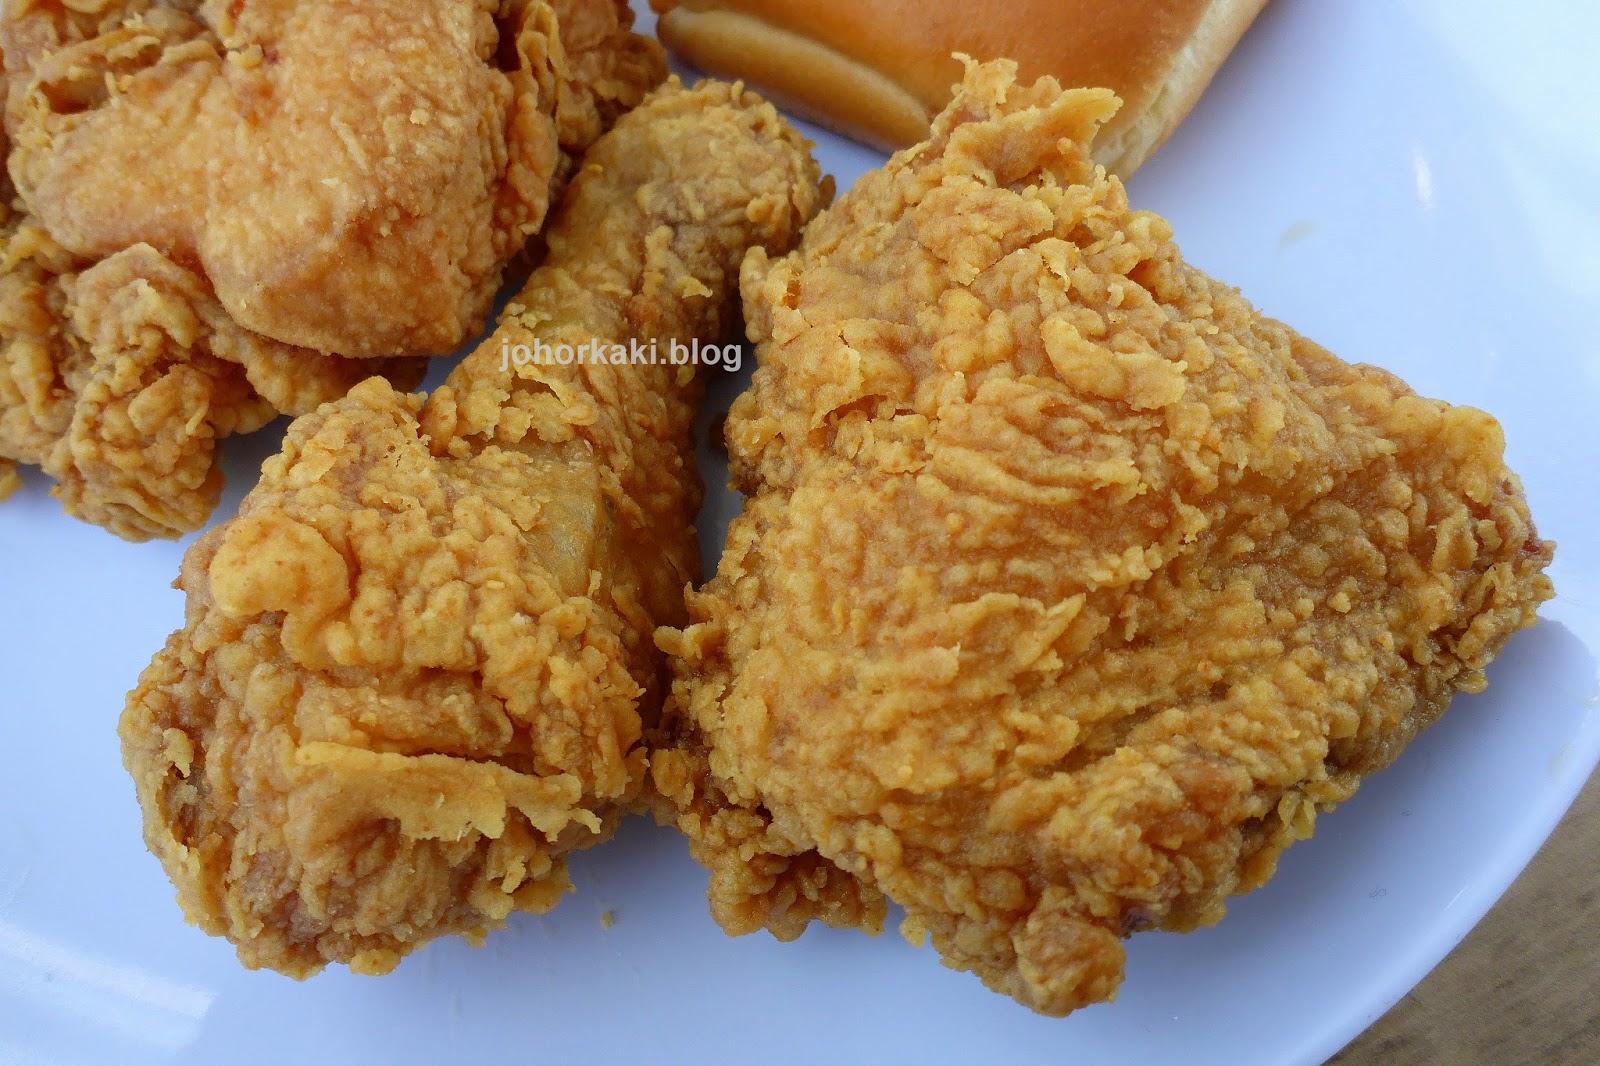 Kfc kentucky fried chicken in nigeria